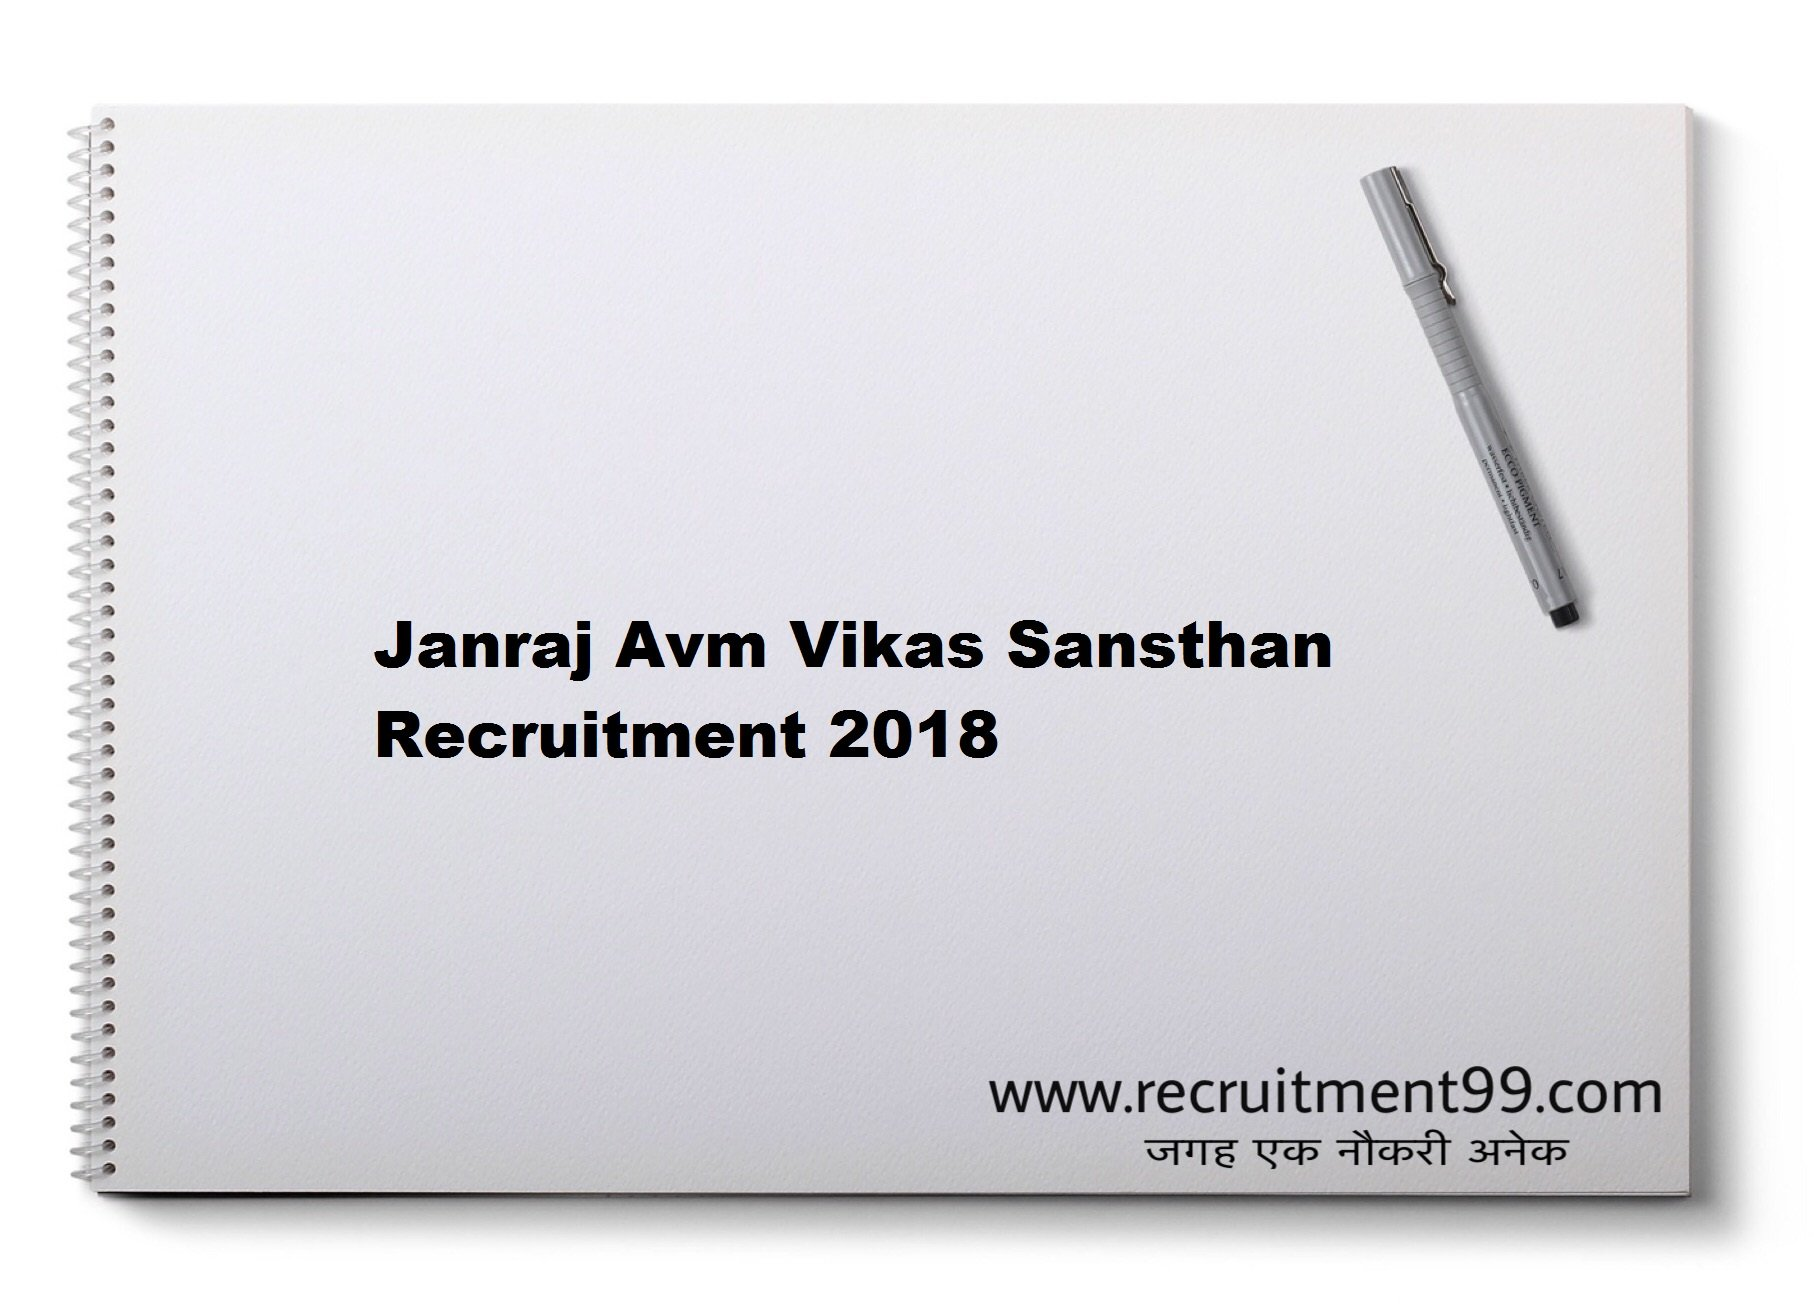 Janraj Avm Vikas Sansthan Sales Center Executive Recruitment & Result 2018